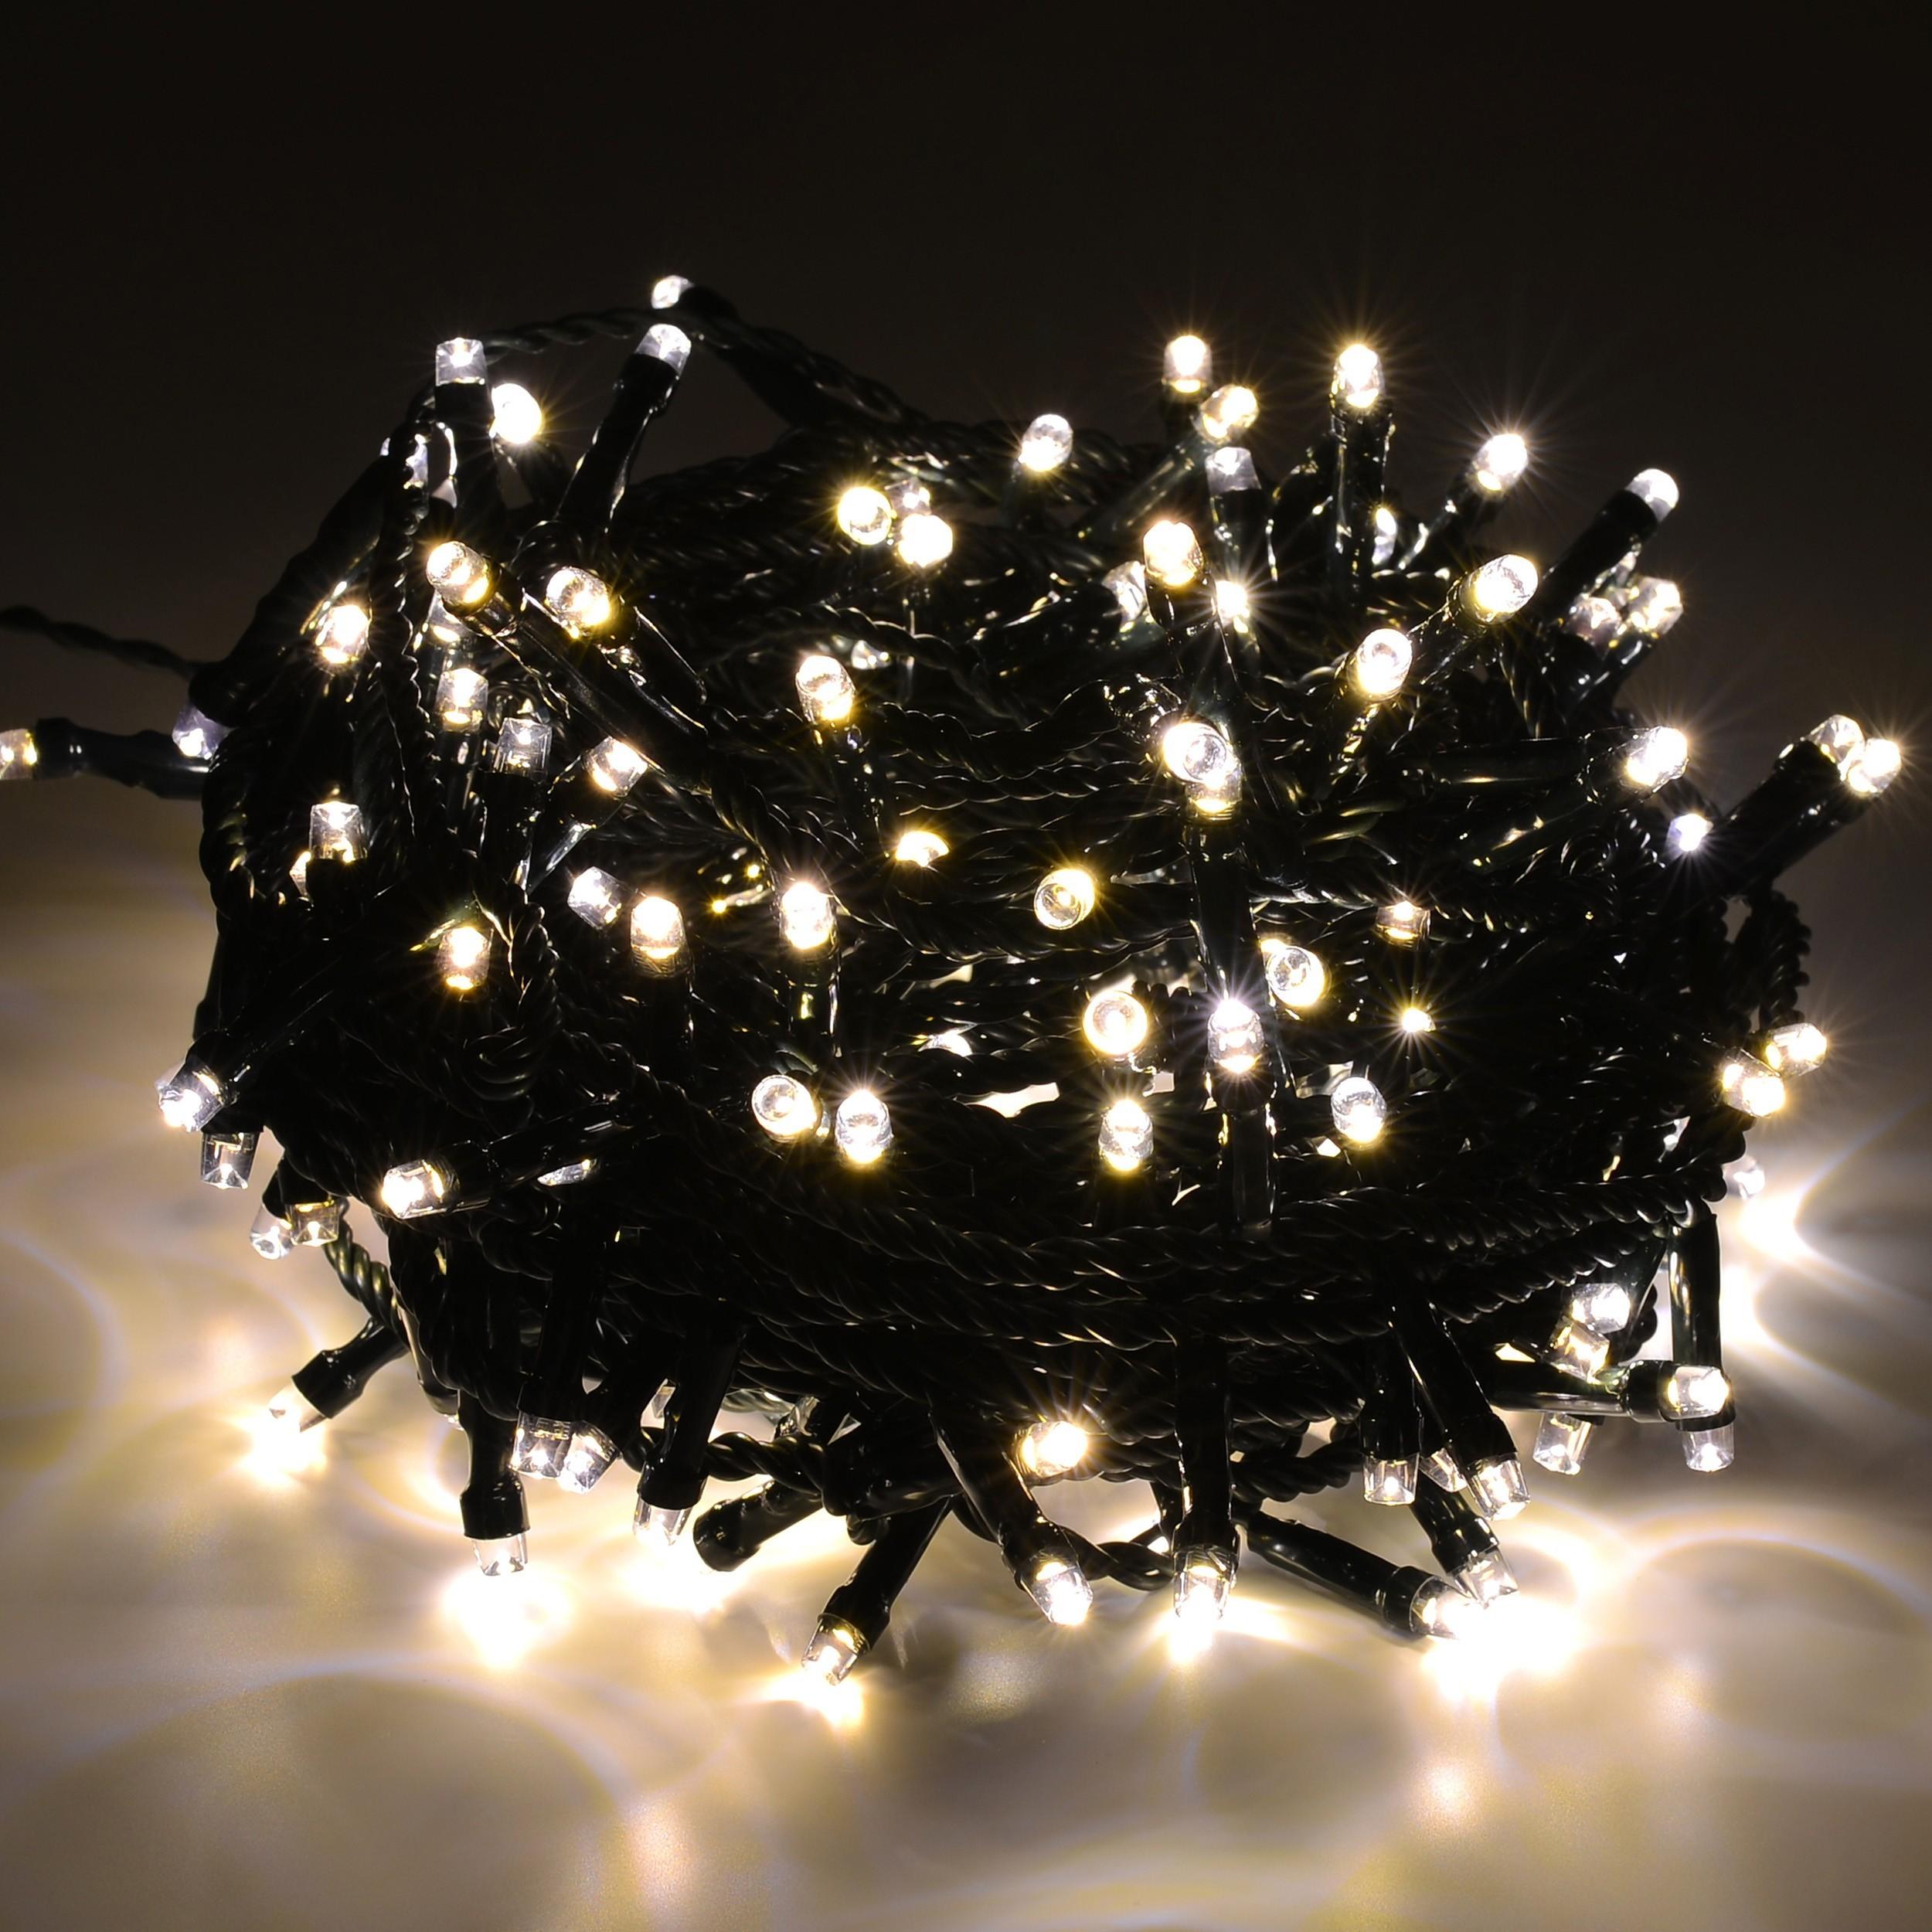 led lichterkette weihnachtsbeleuchtung outdoor warmwei 80. Black Bedroom Furniture Sets. Home Design Ideas